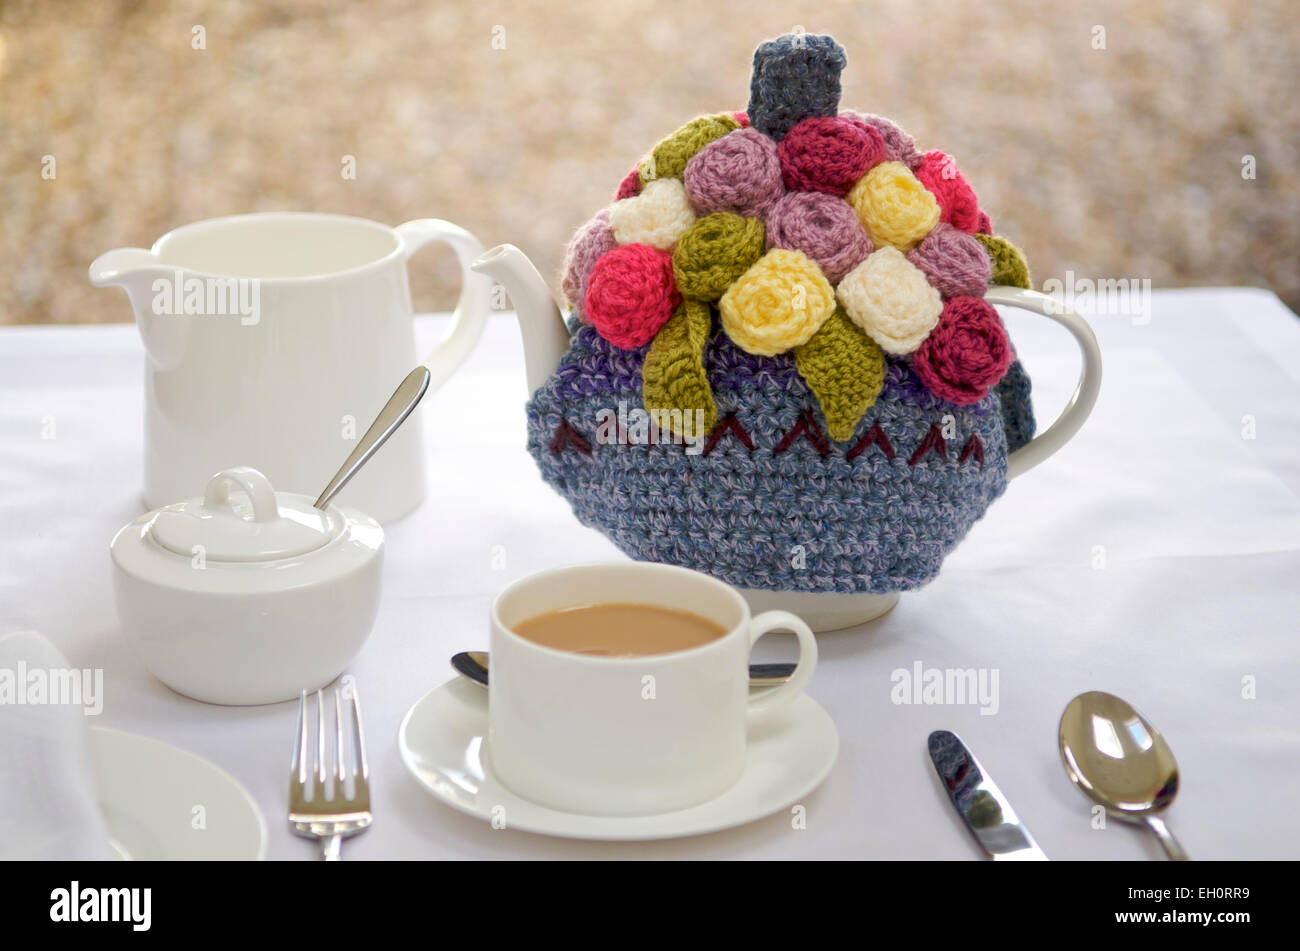 Ornate tea cosy on a teapot - Stock Image